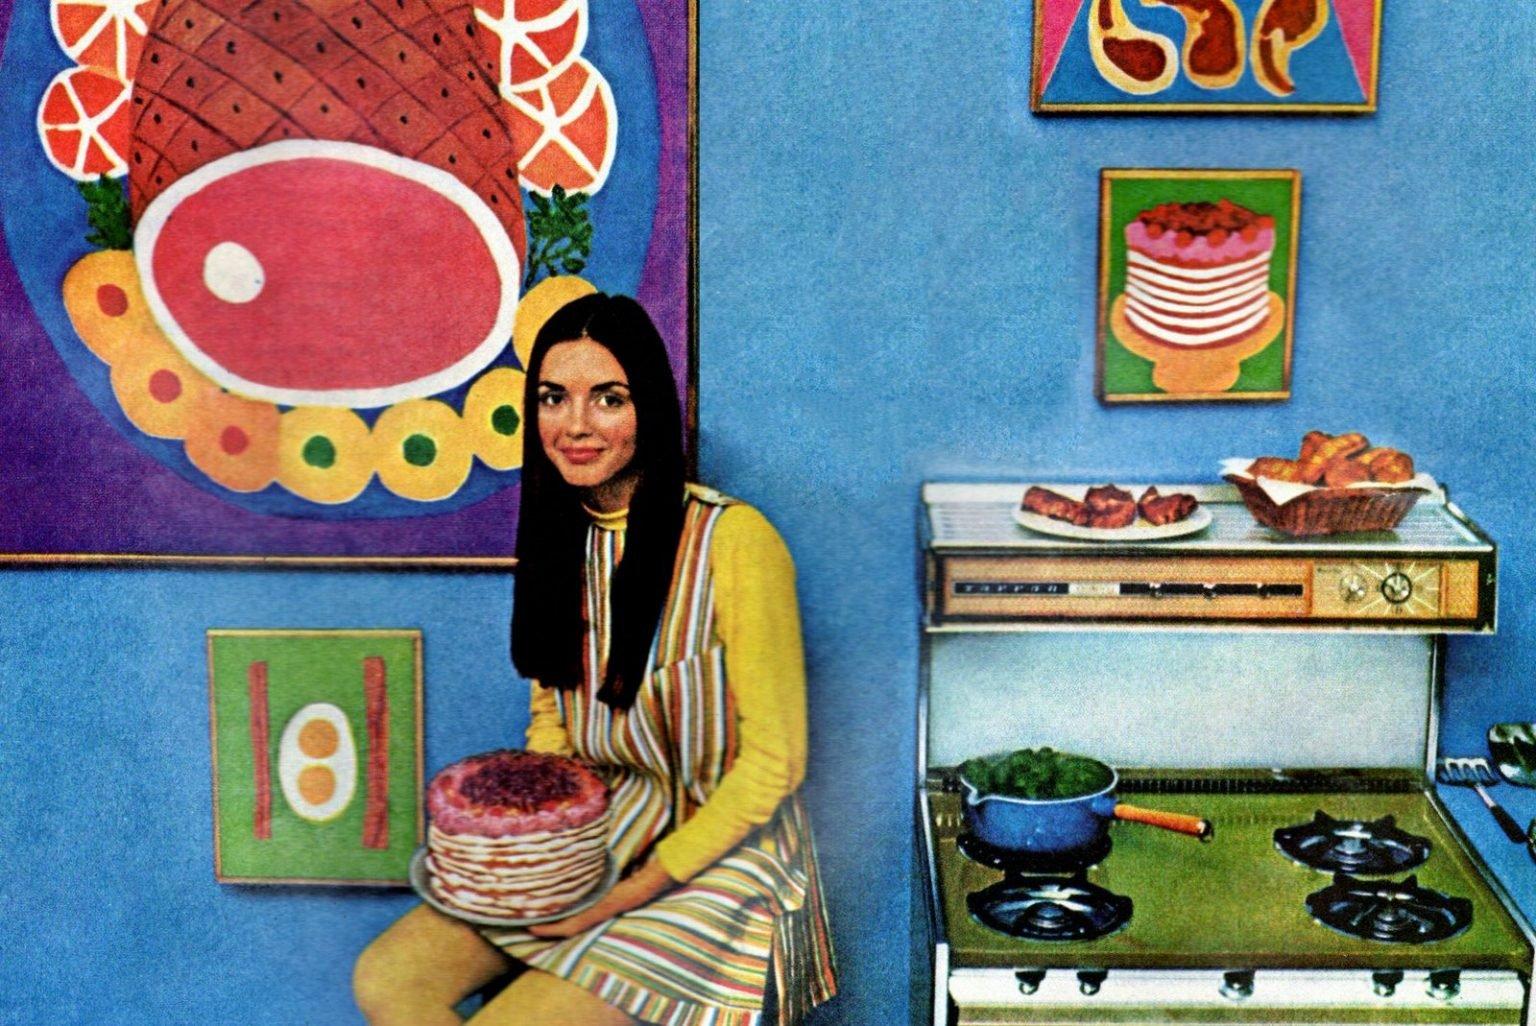 Vintage kitchen appliances - The Tappan Gallery Gas Range